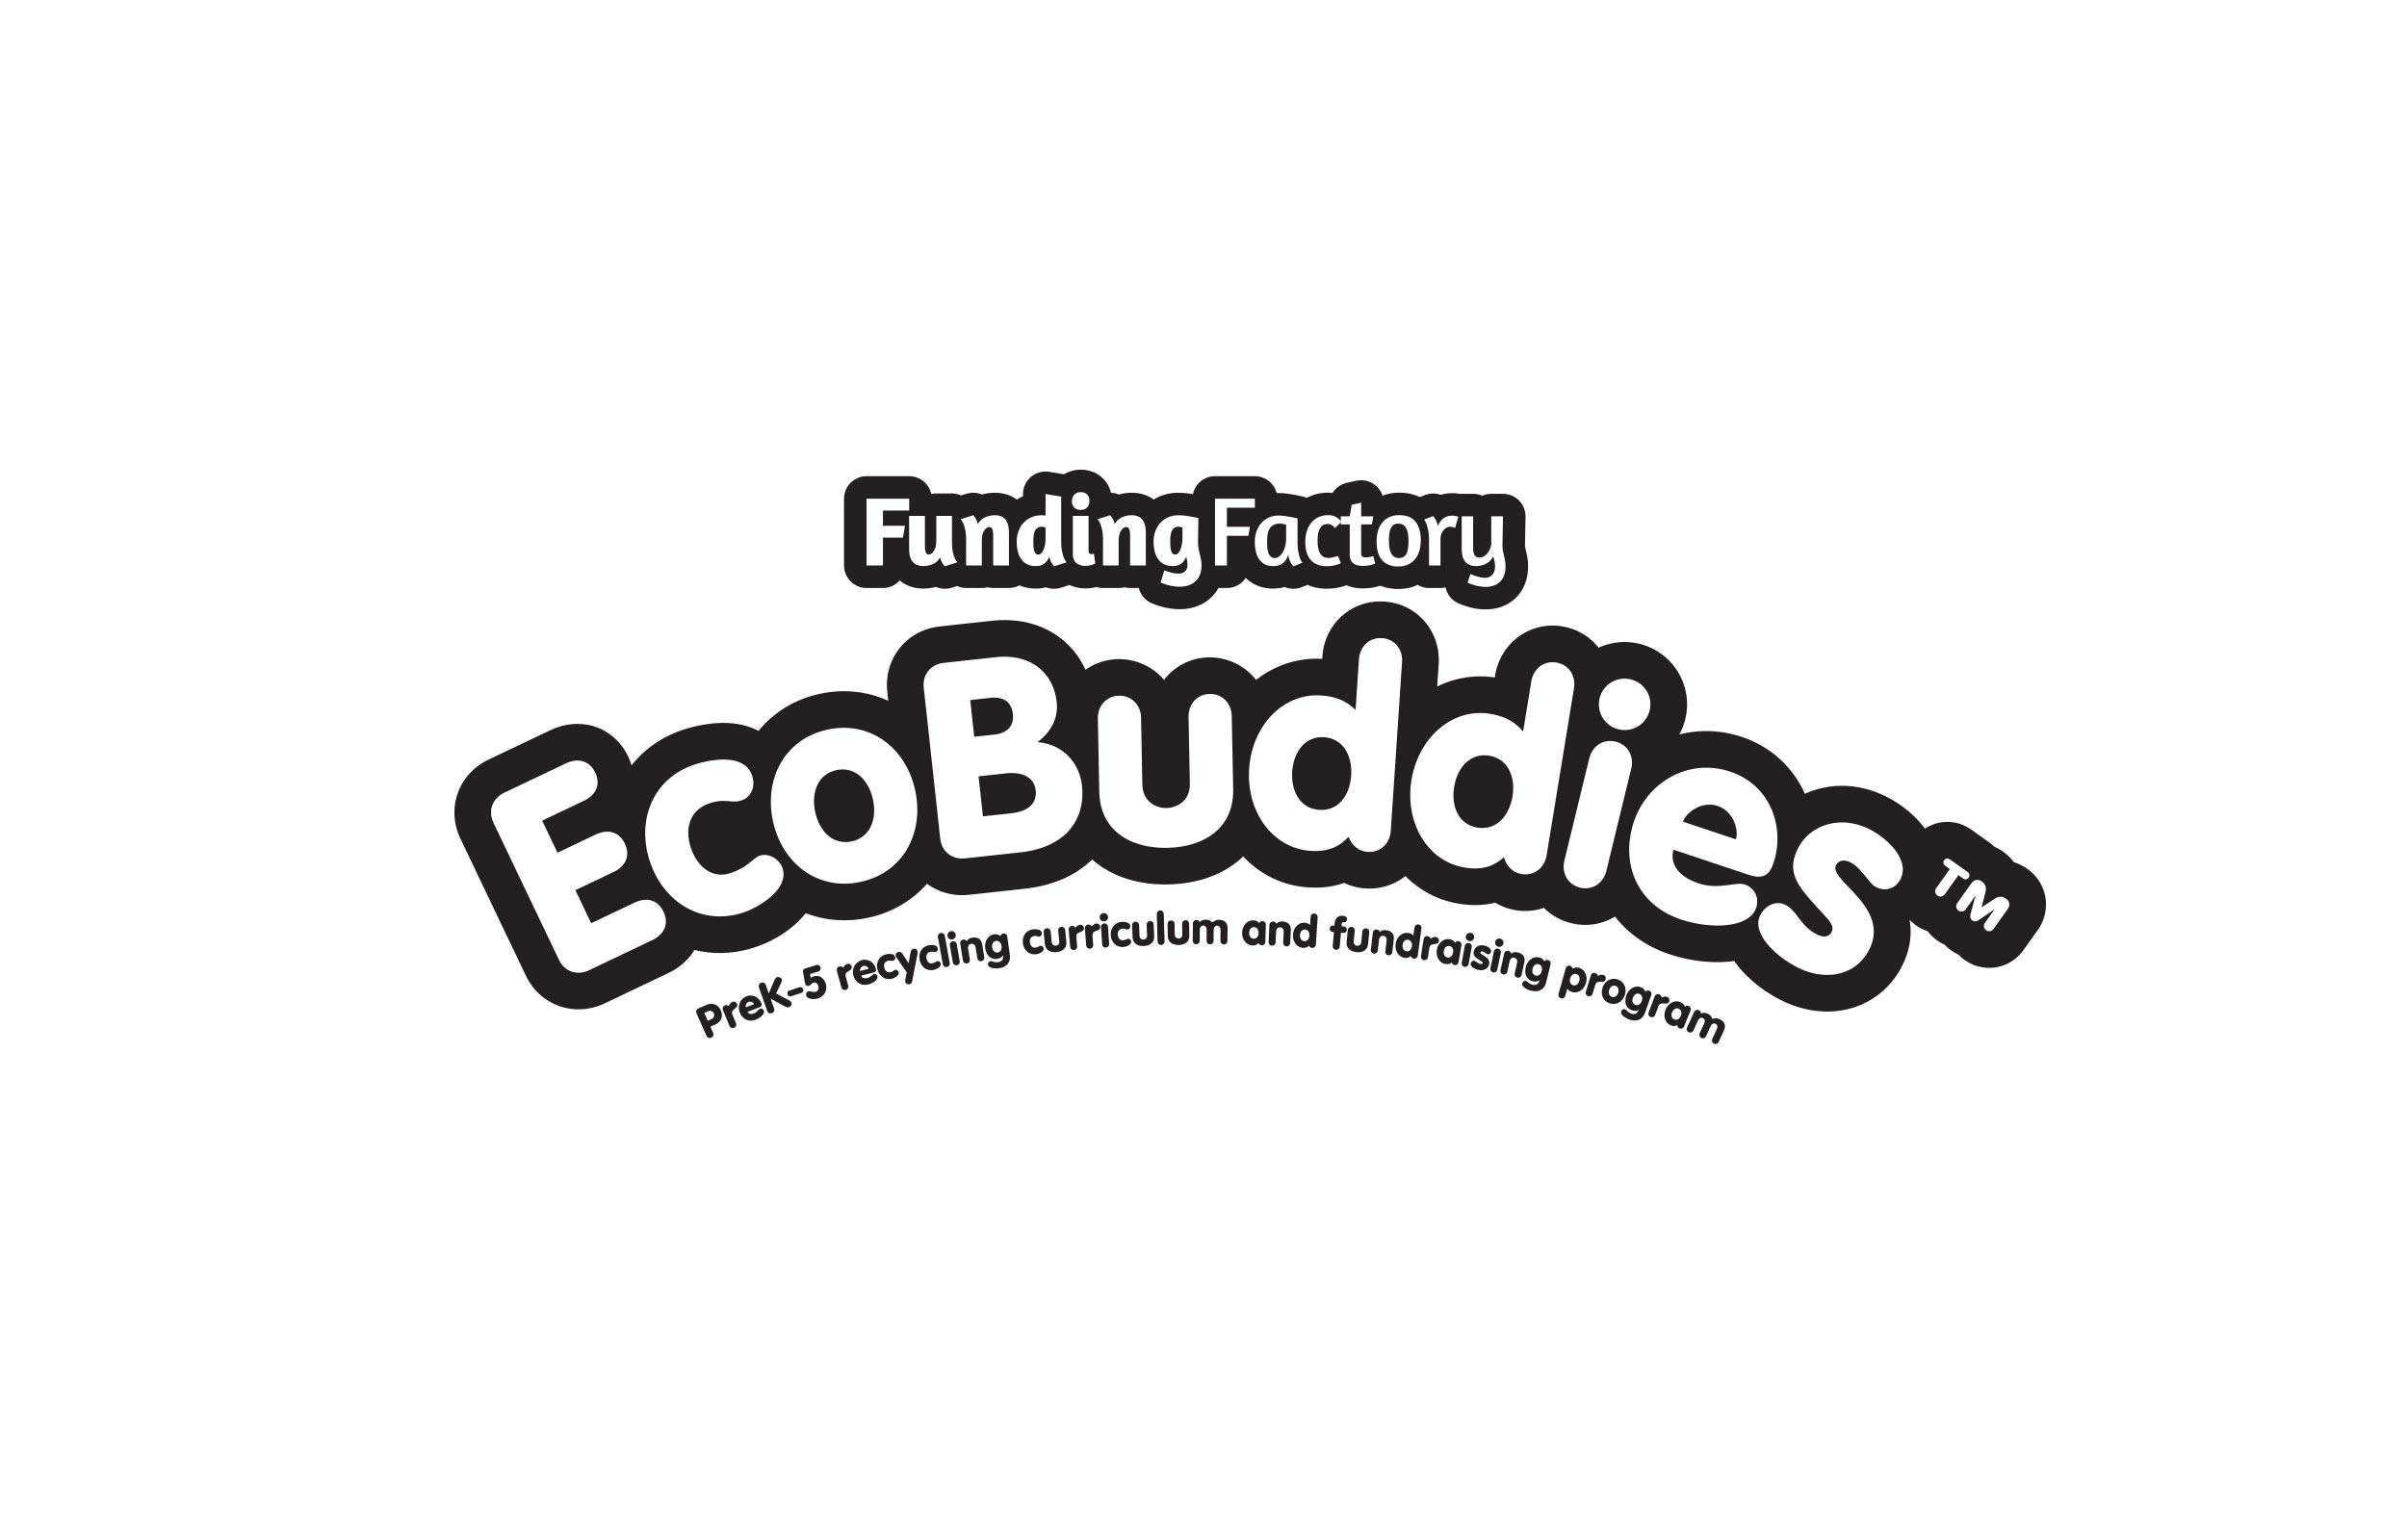 http://papaadvertising.com/wp-content/uploads/2015/04/EB-Logo.jpg